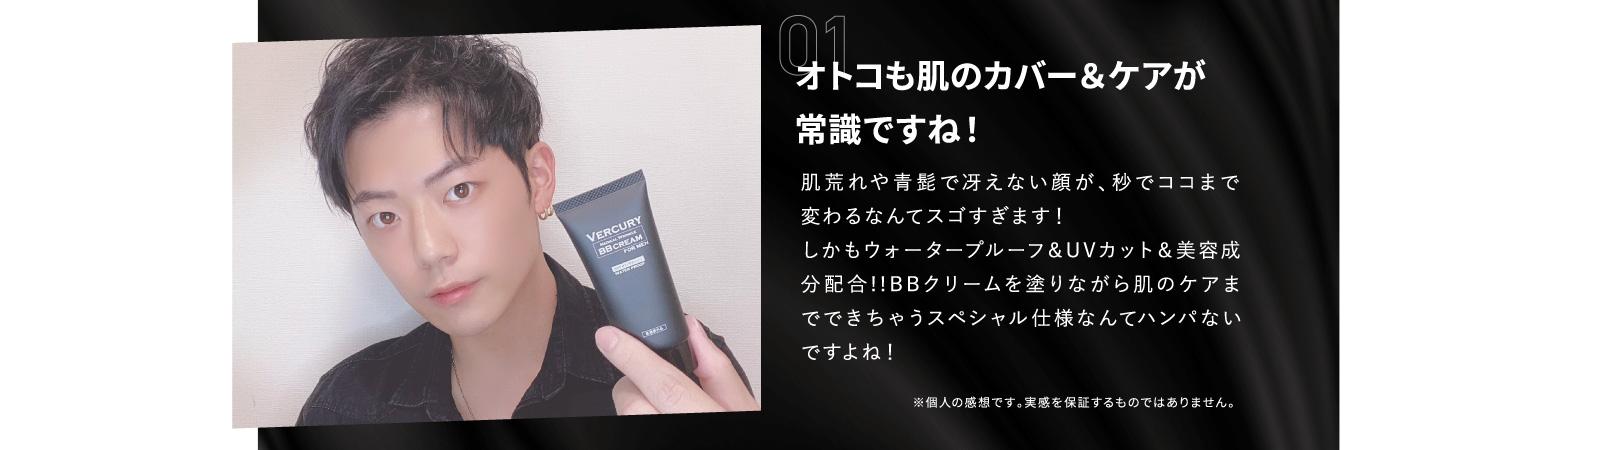 USER VOICE 01